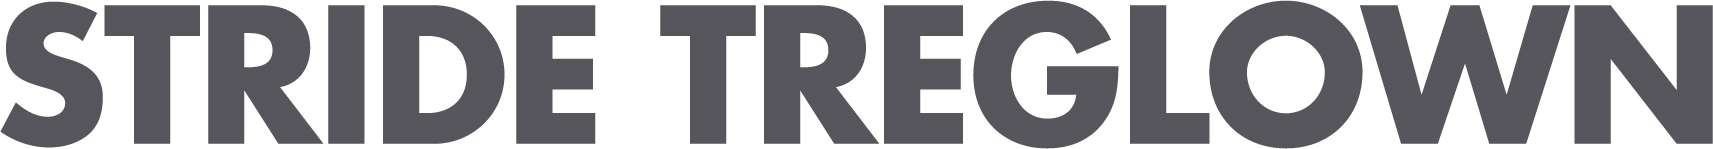 Stride_Treglown_Logo_new.jpg